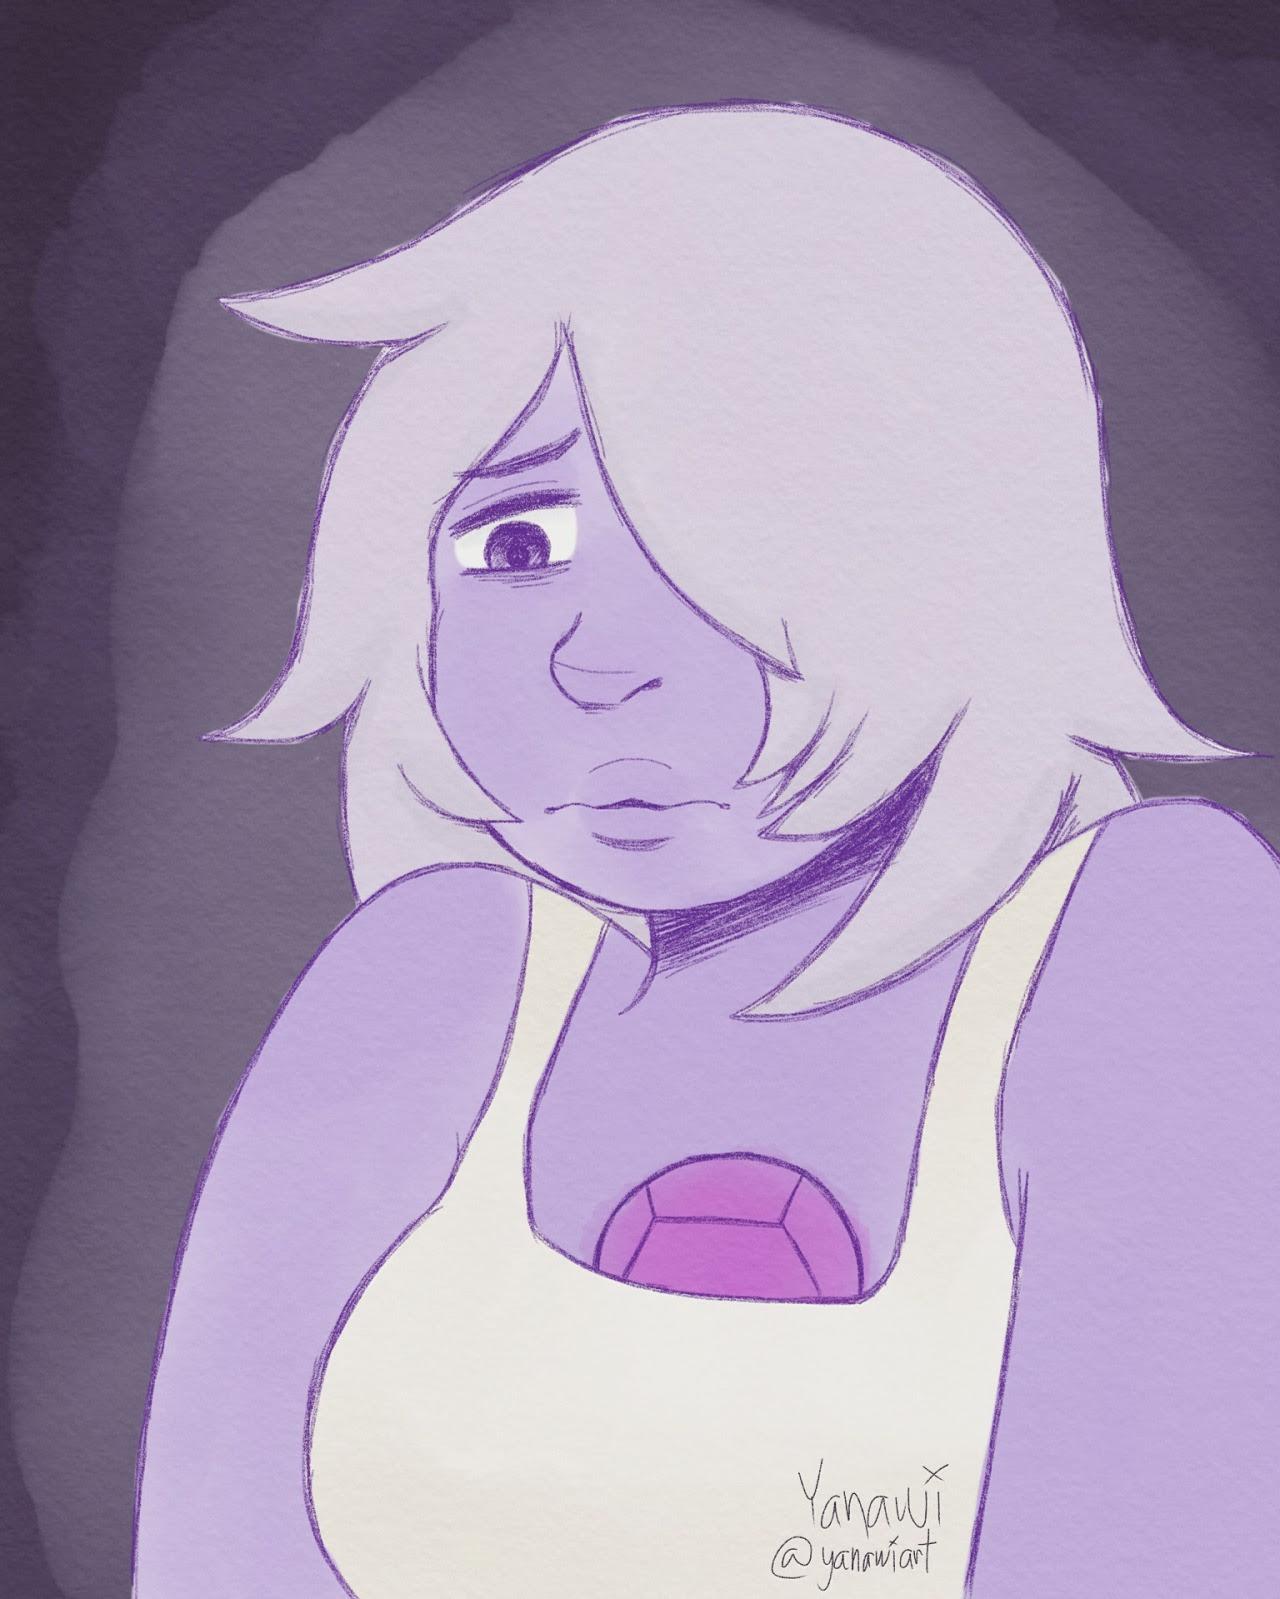 """I'm the weakest crystal gem now."" — (btw that's my Instagram account)"